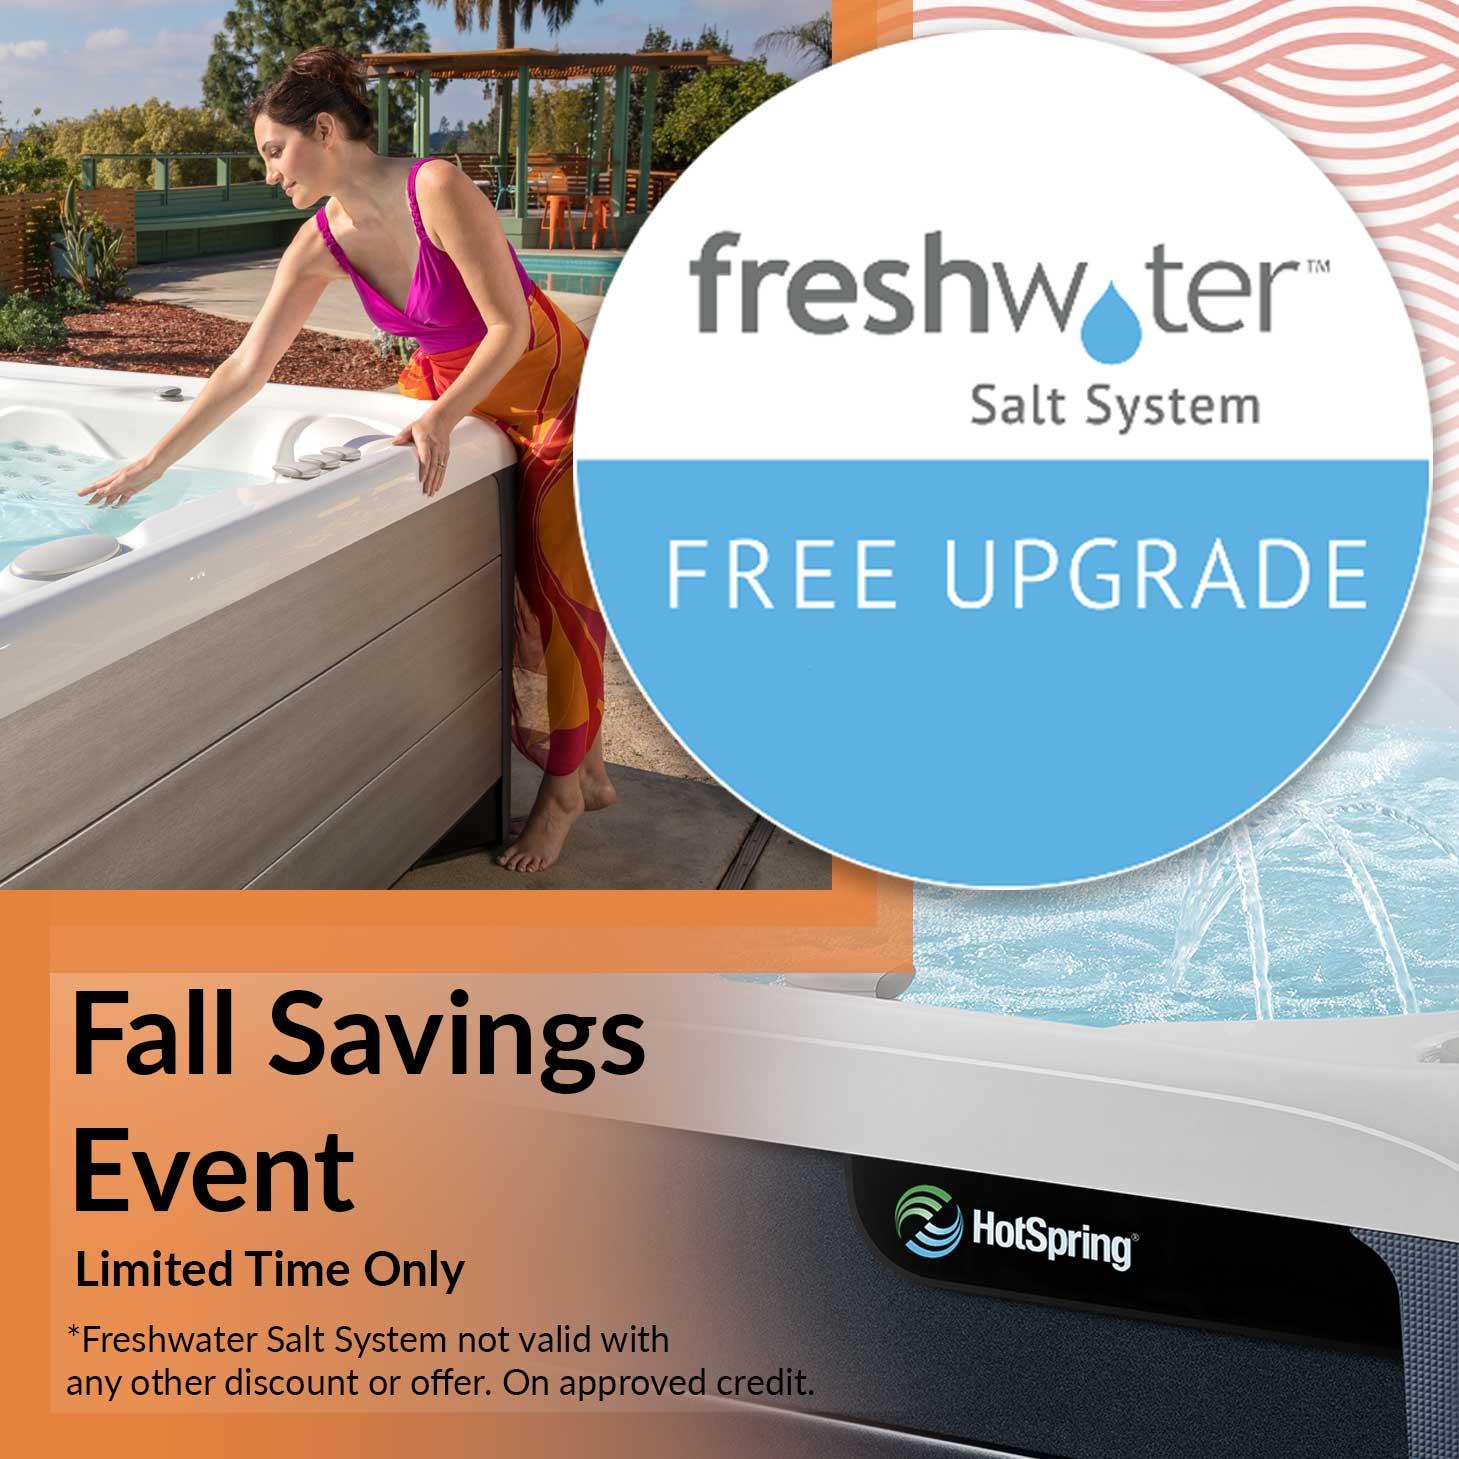 Fall Savings Event – Free Freshwater Upgrade